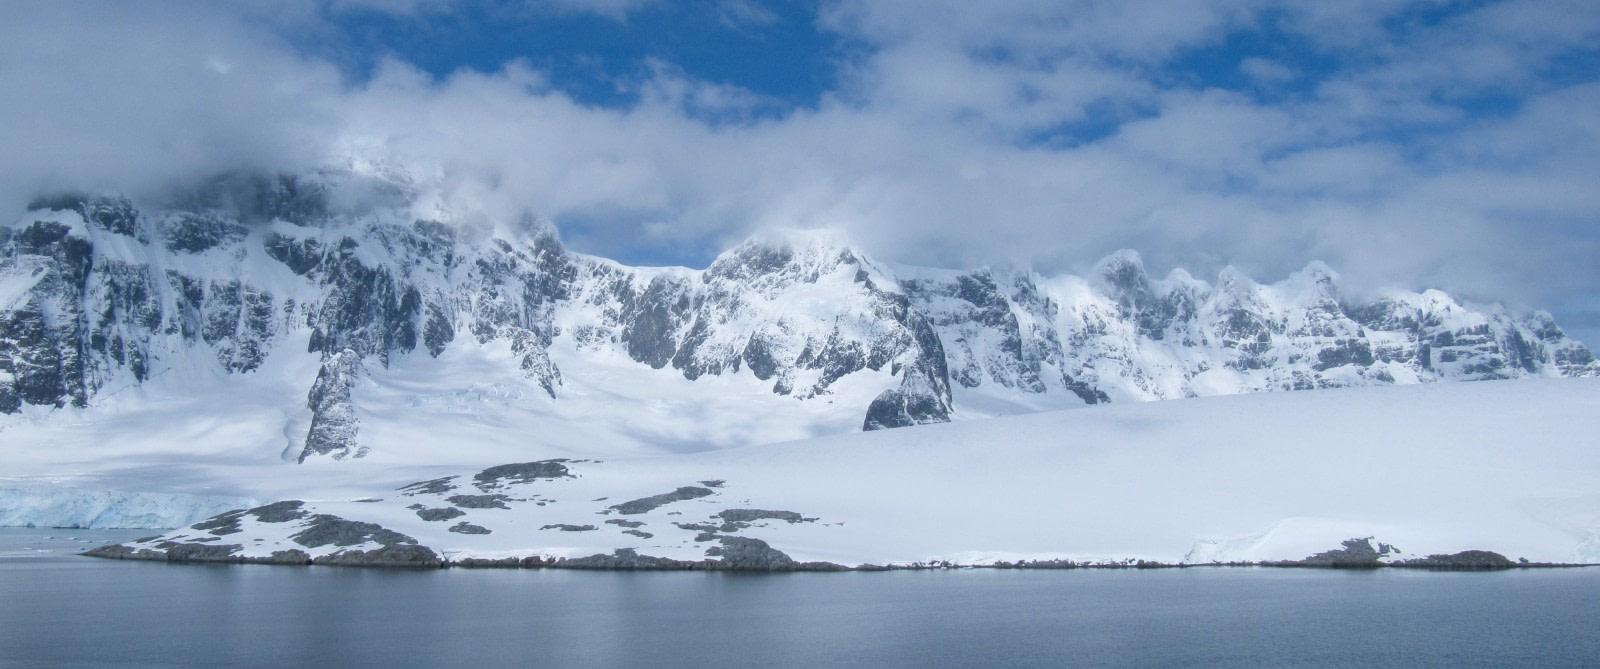 Antarctic Peninsula's magical scenery